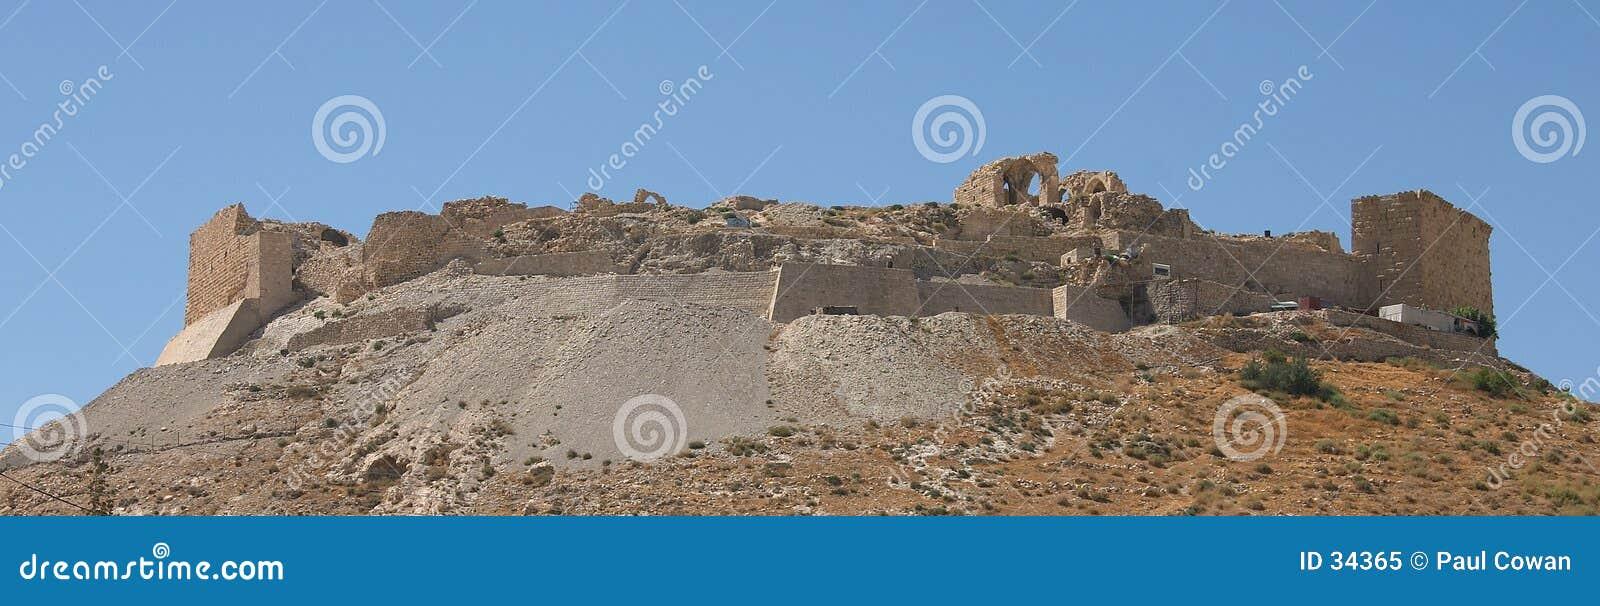 Het Kasteel van Shawbak, Jordanië